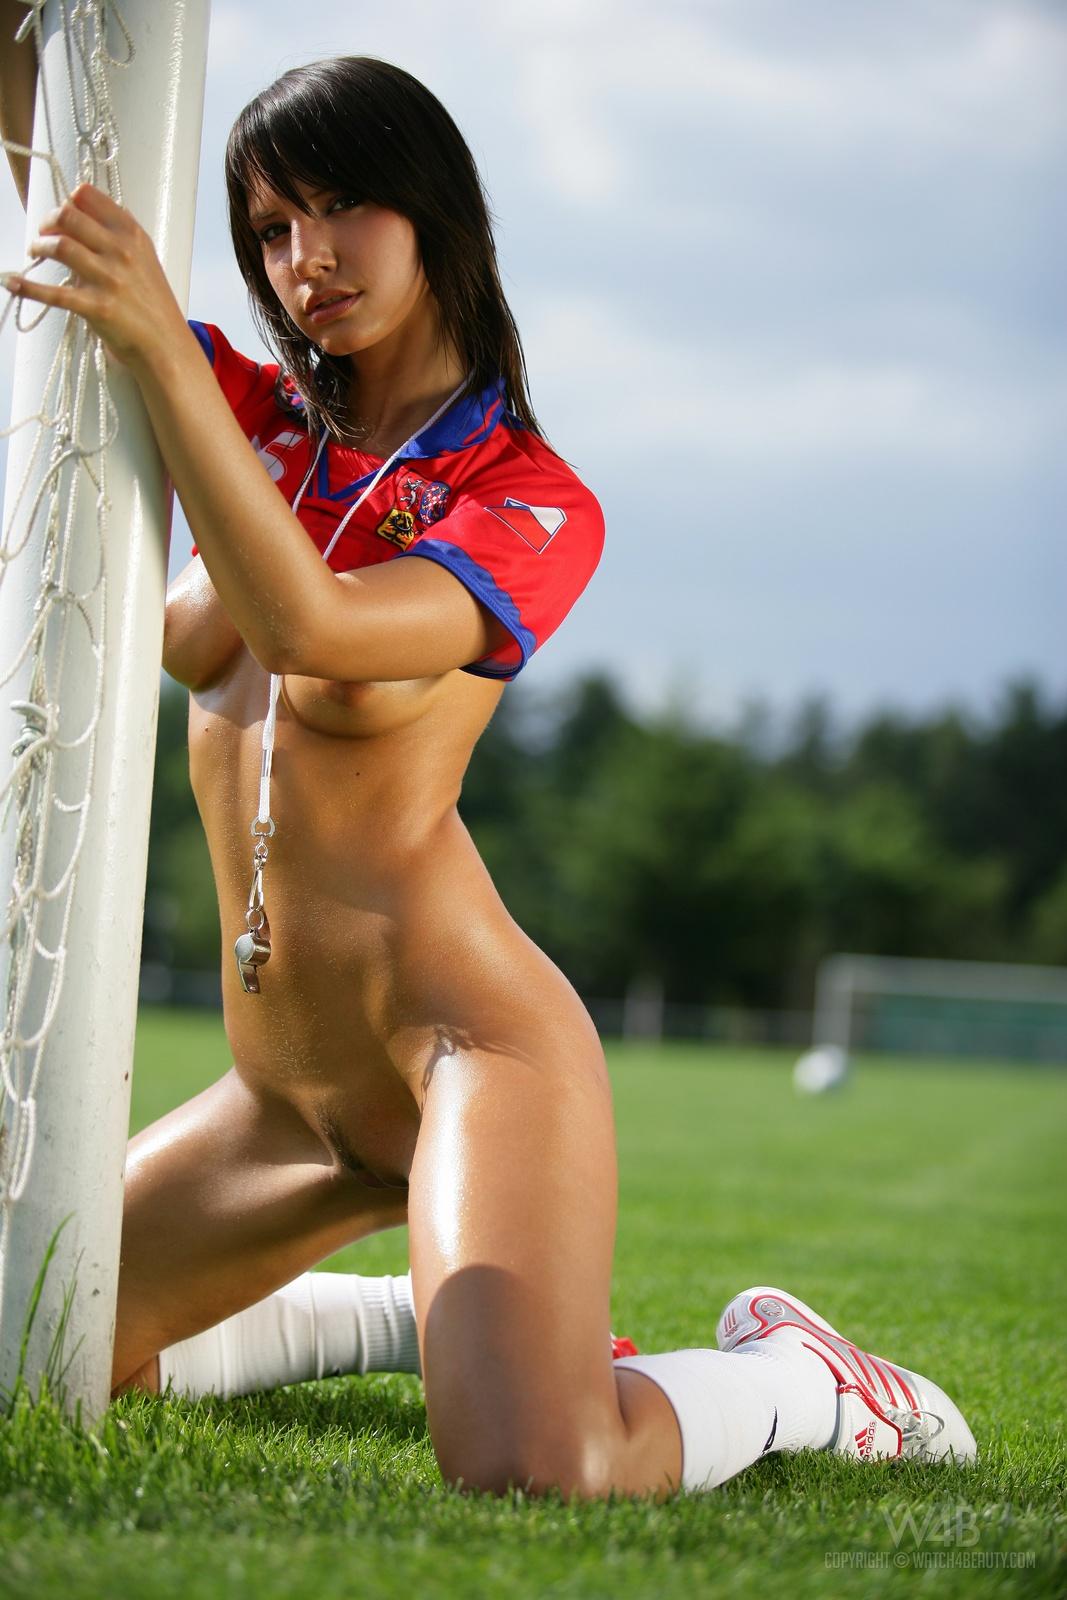 monika-vesela-nude-football-watch4beauty-29